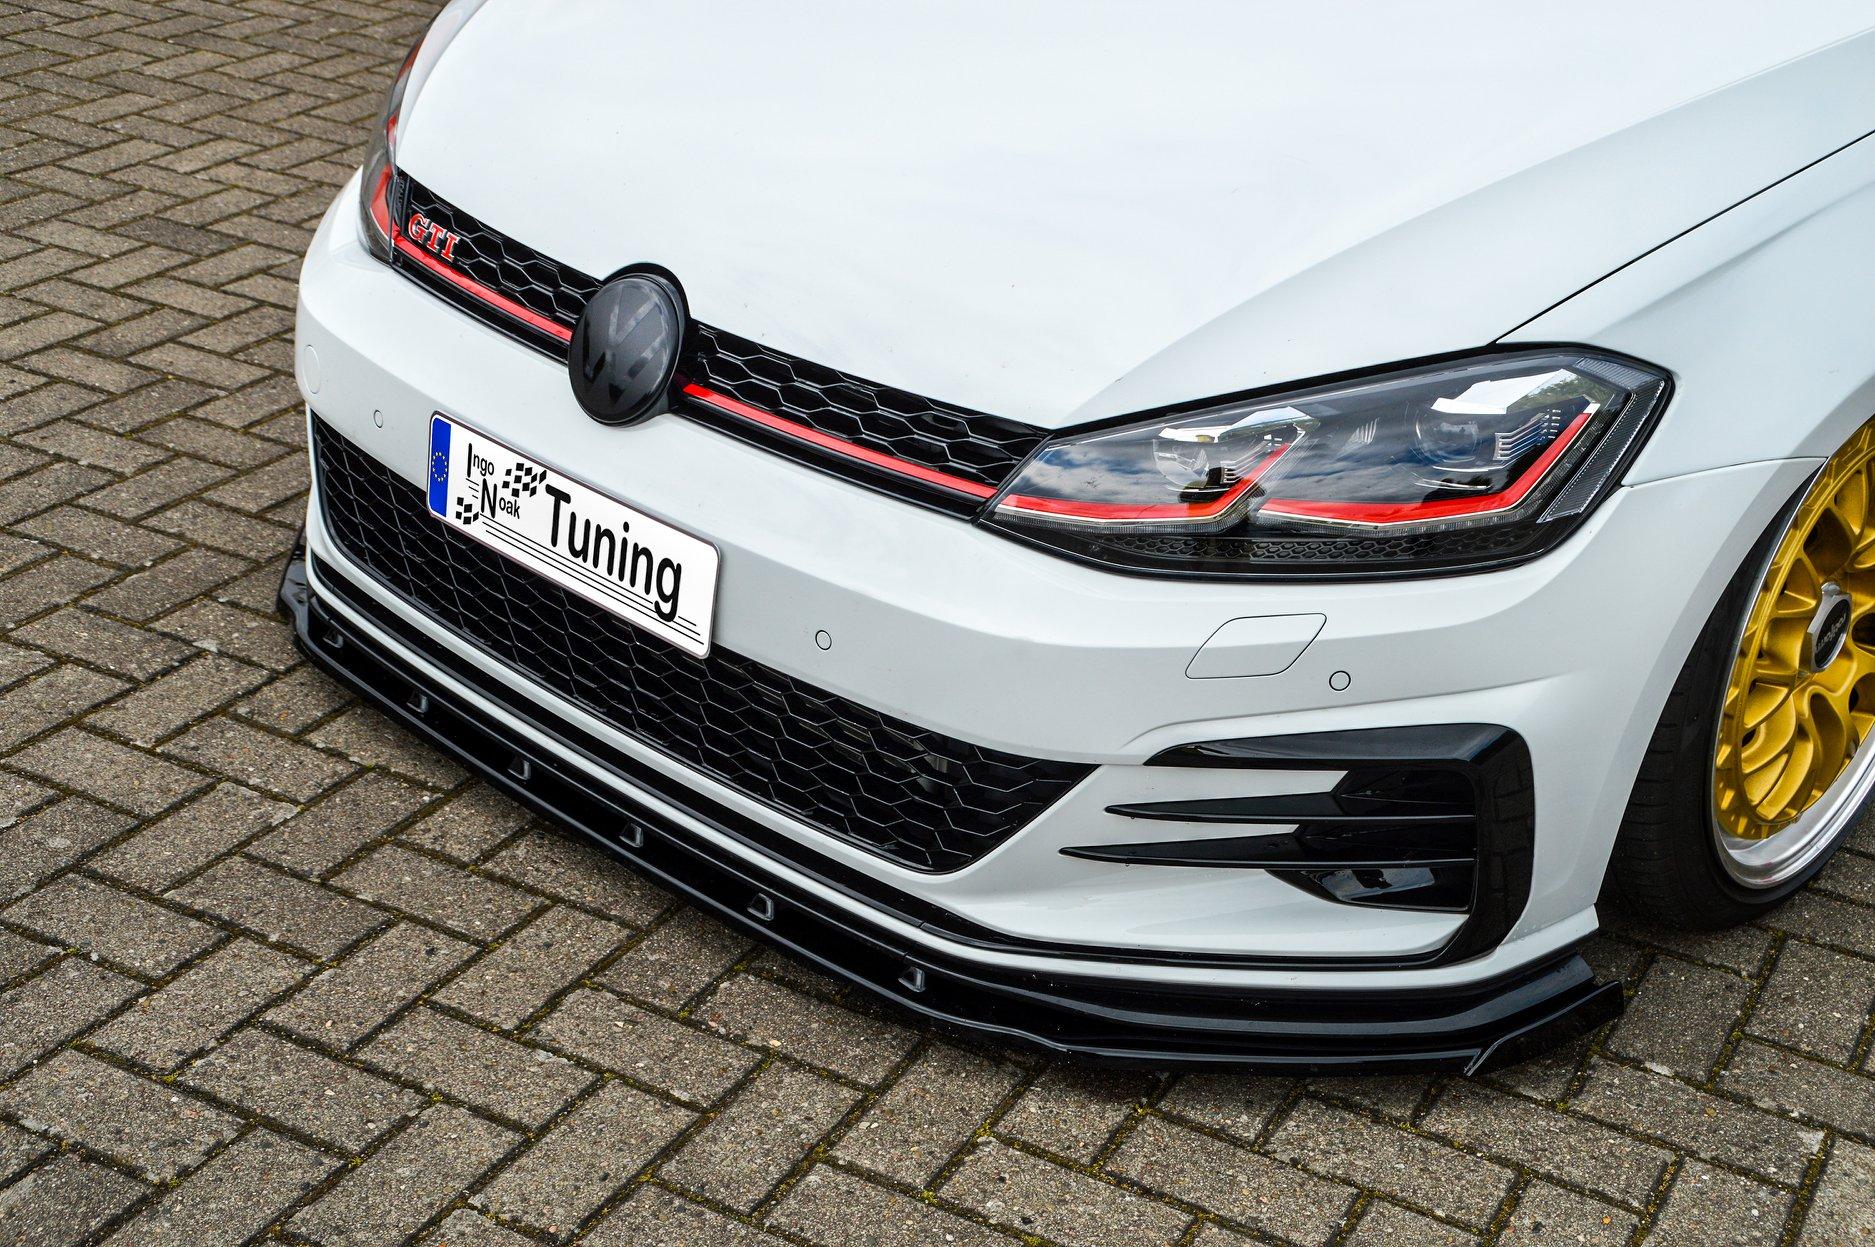 VW-Golf-7-GTI-TCR-by-Ingo-Noak-Tuning-3